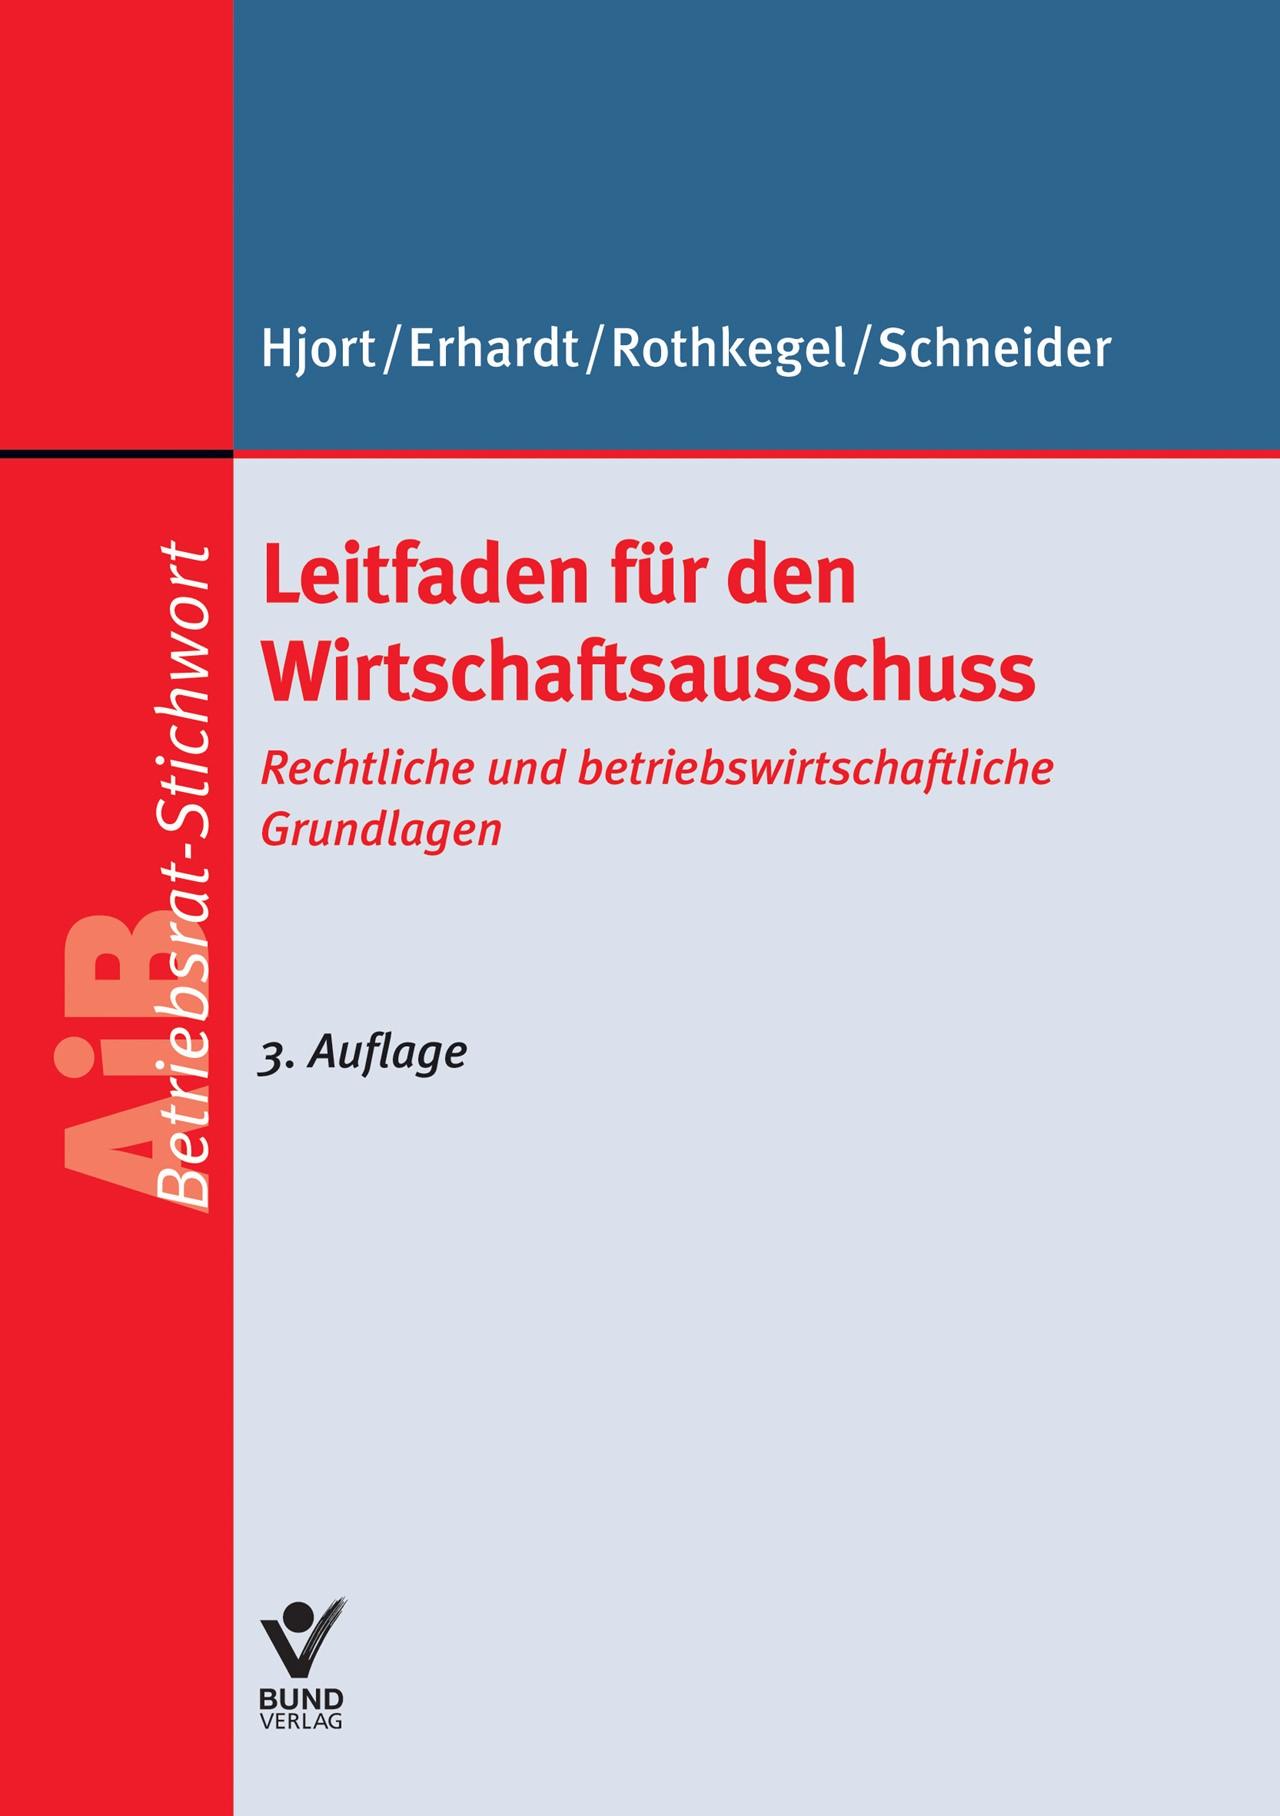 Leitfaden für den Wirtschaftsausschuss | Hjort / Erhardt / Rothkegel, 2014 (Cover)